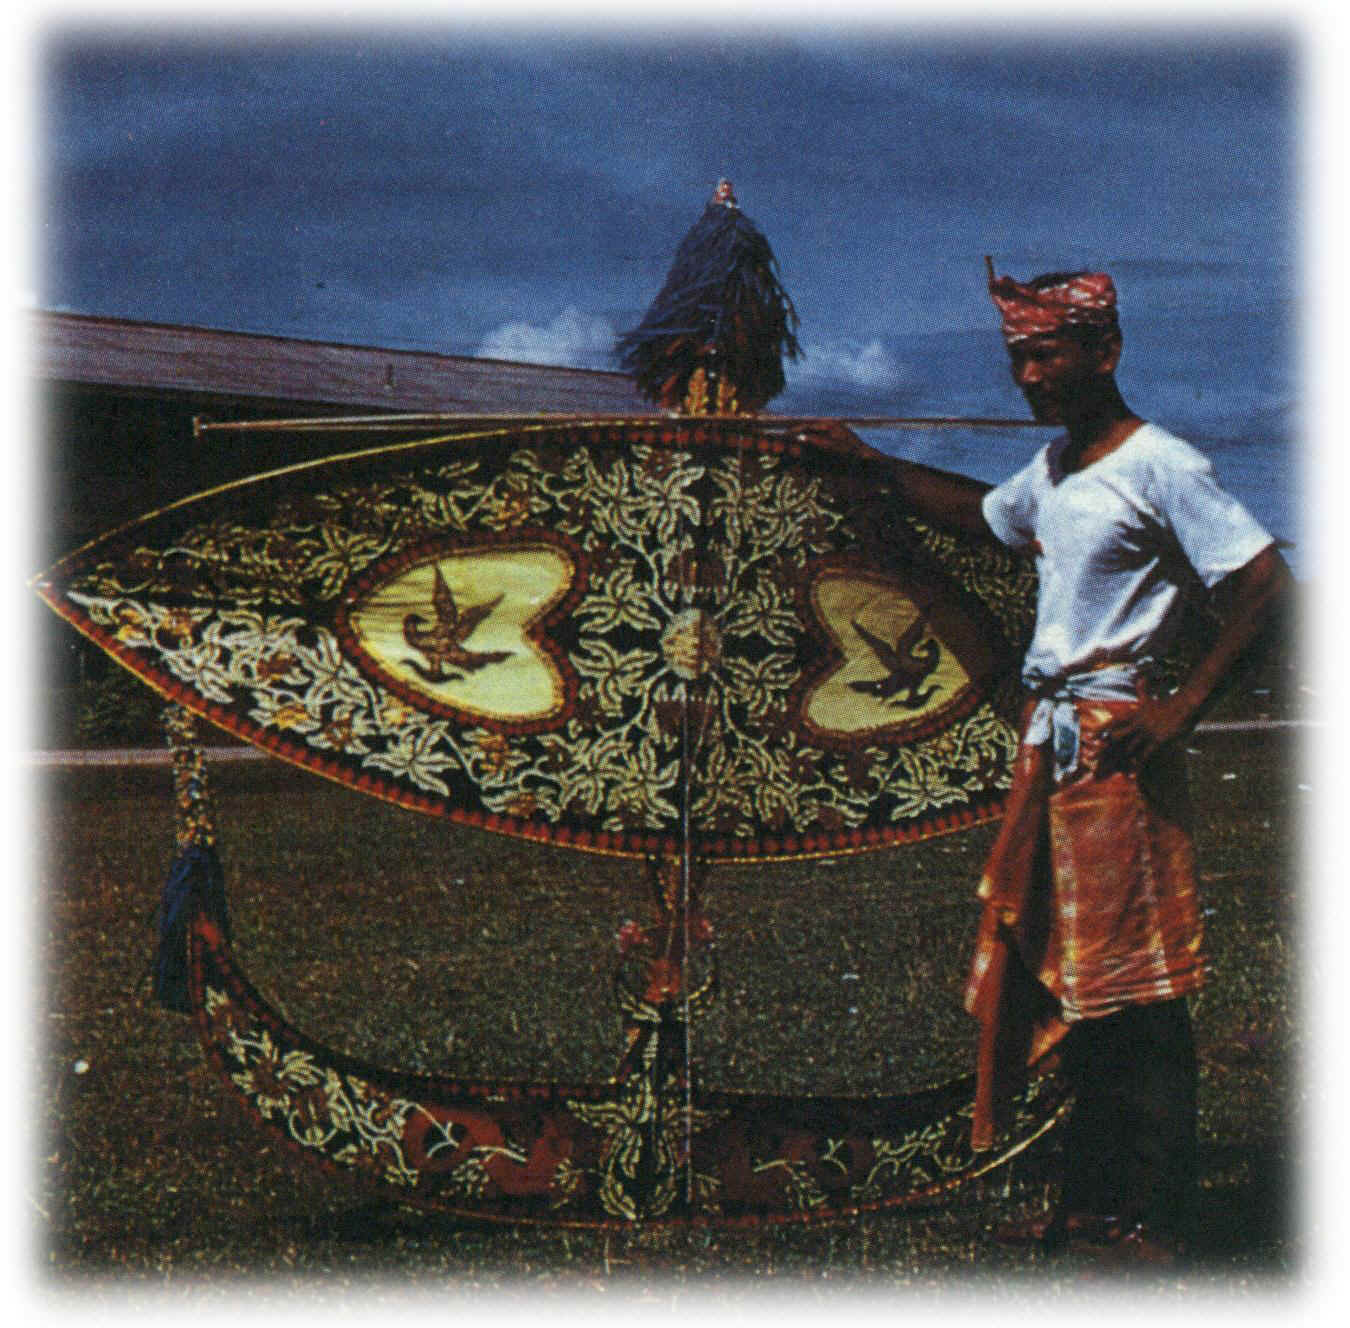 Saya Berbangsa Melayu: Imej Permainan Tradisional Melayu